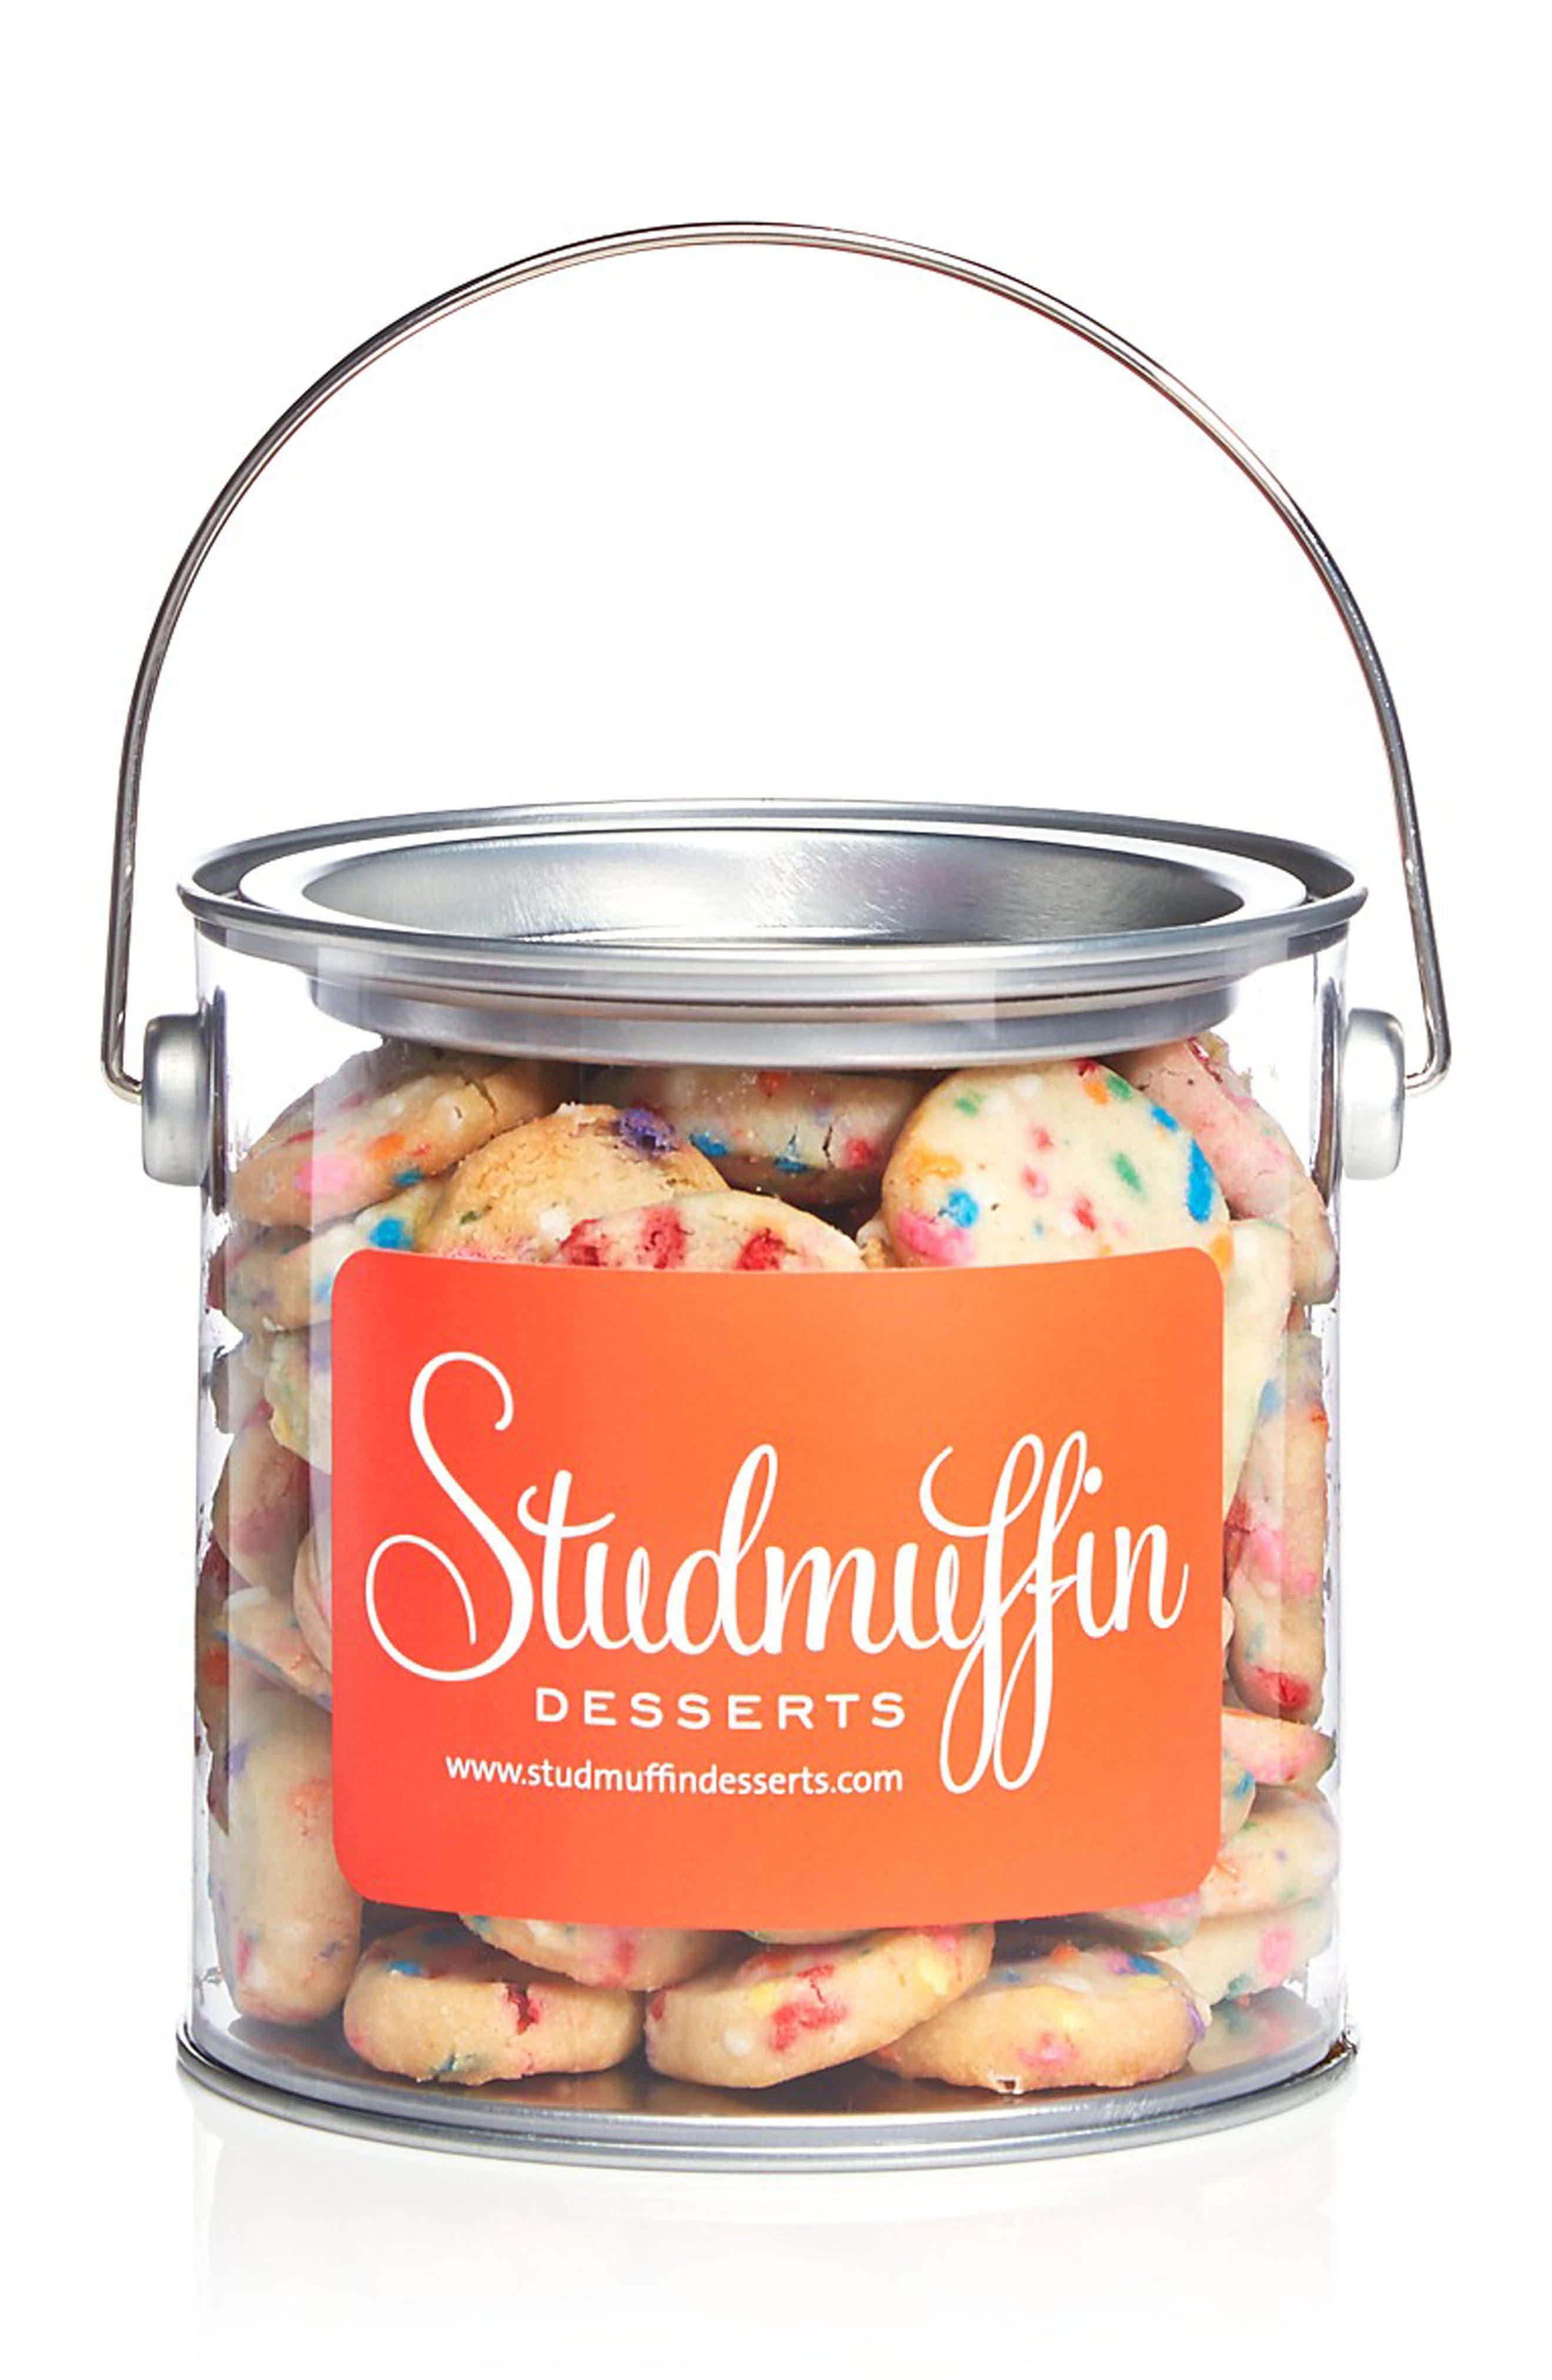 Main Image - Stud Buckets Marie Antoinette Cookie Bites